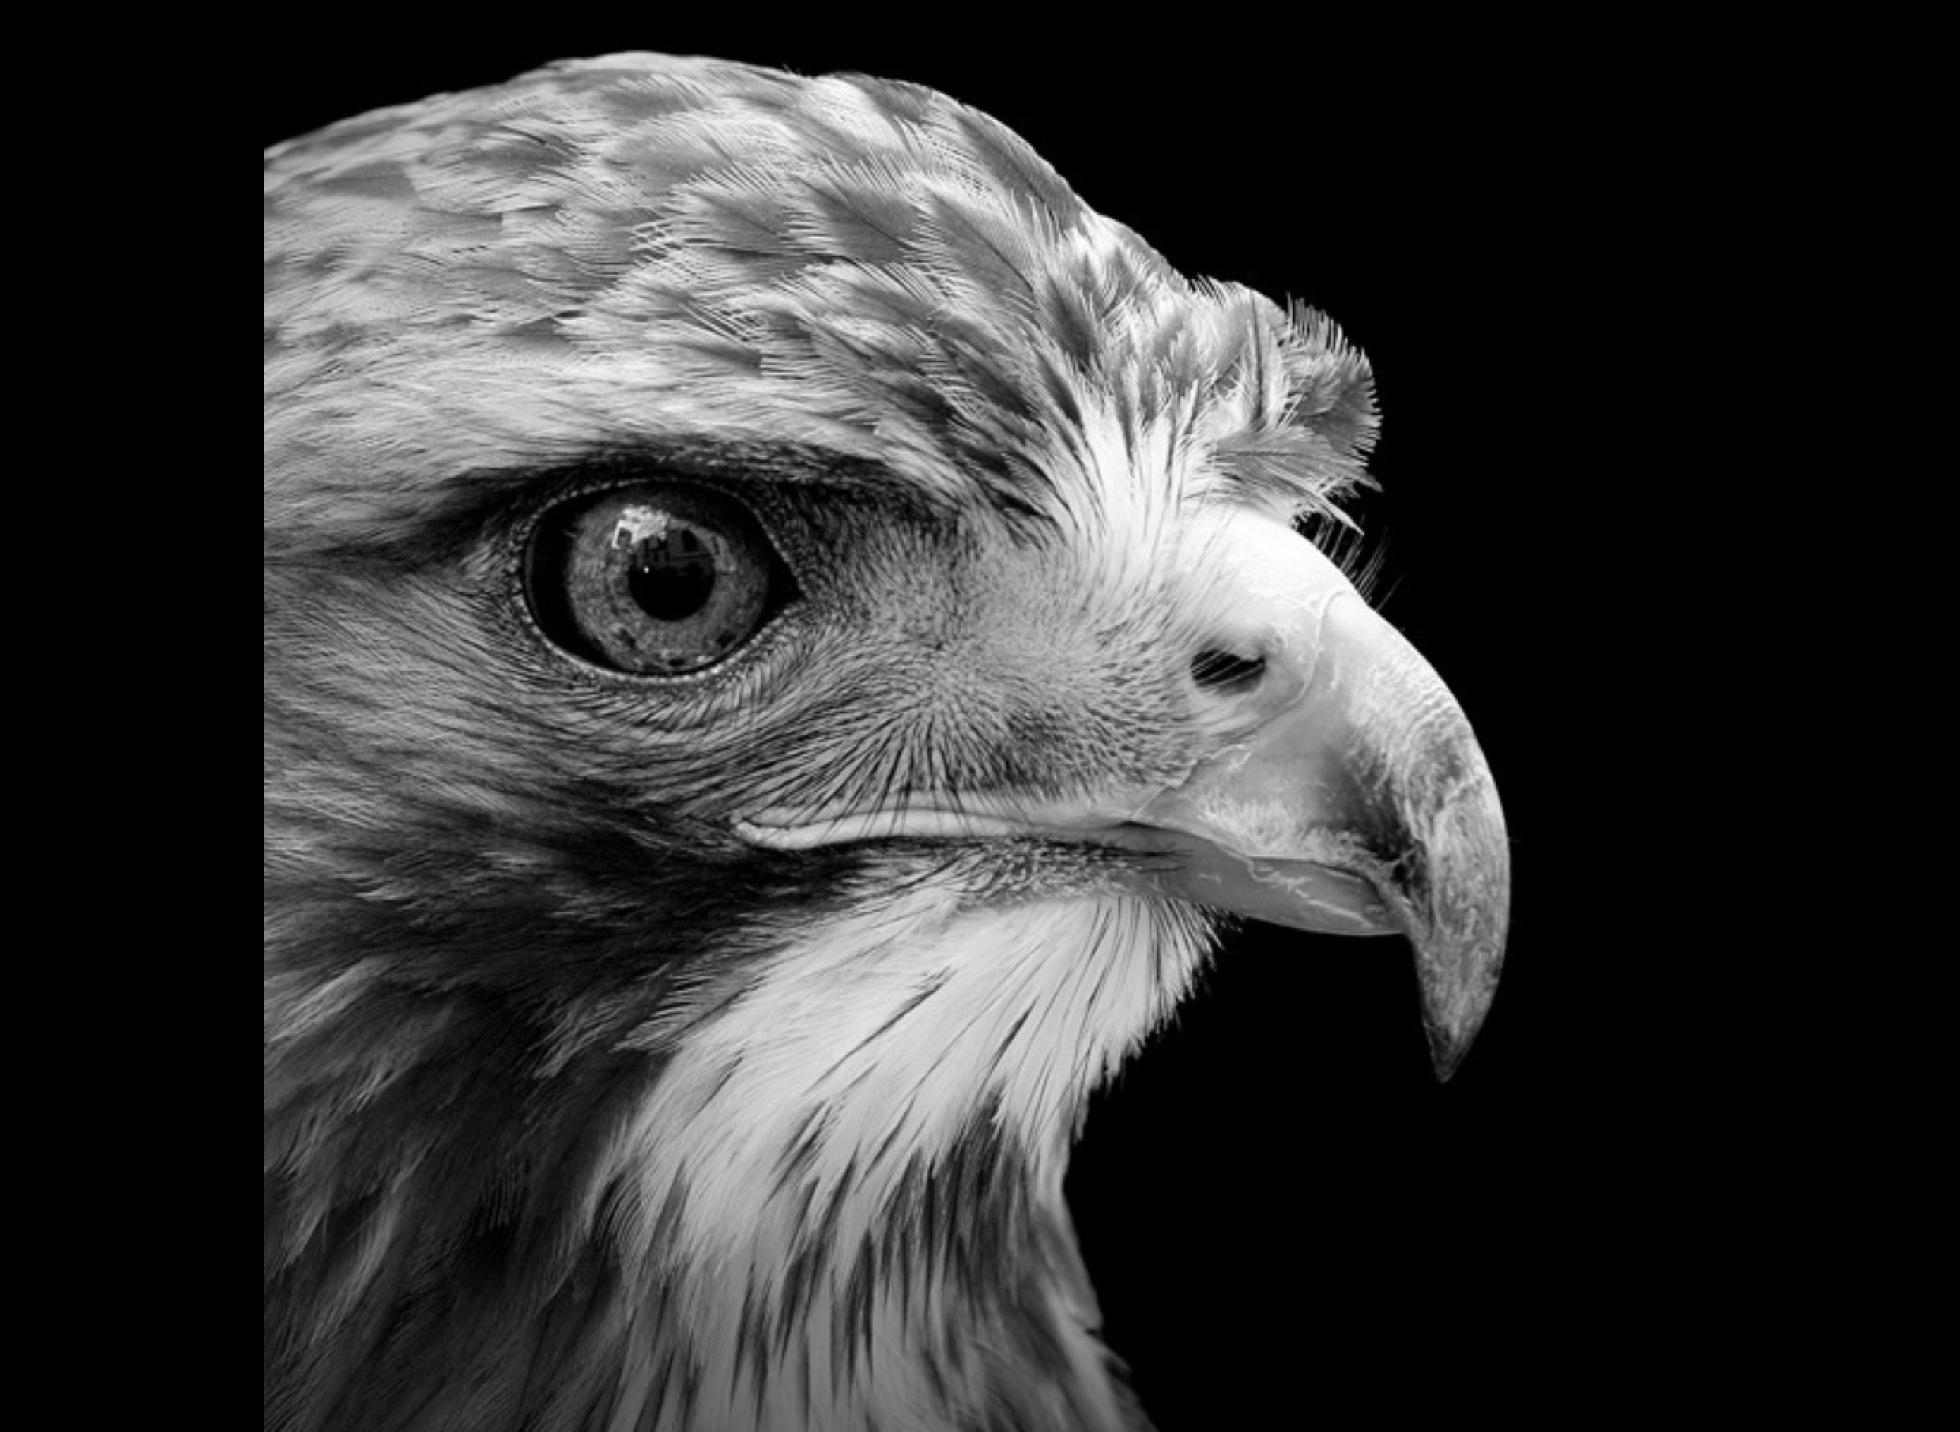 Beautiful black and white photos of animals - Yummypets